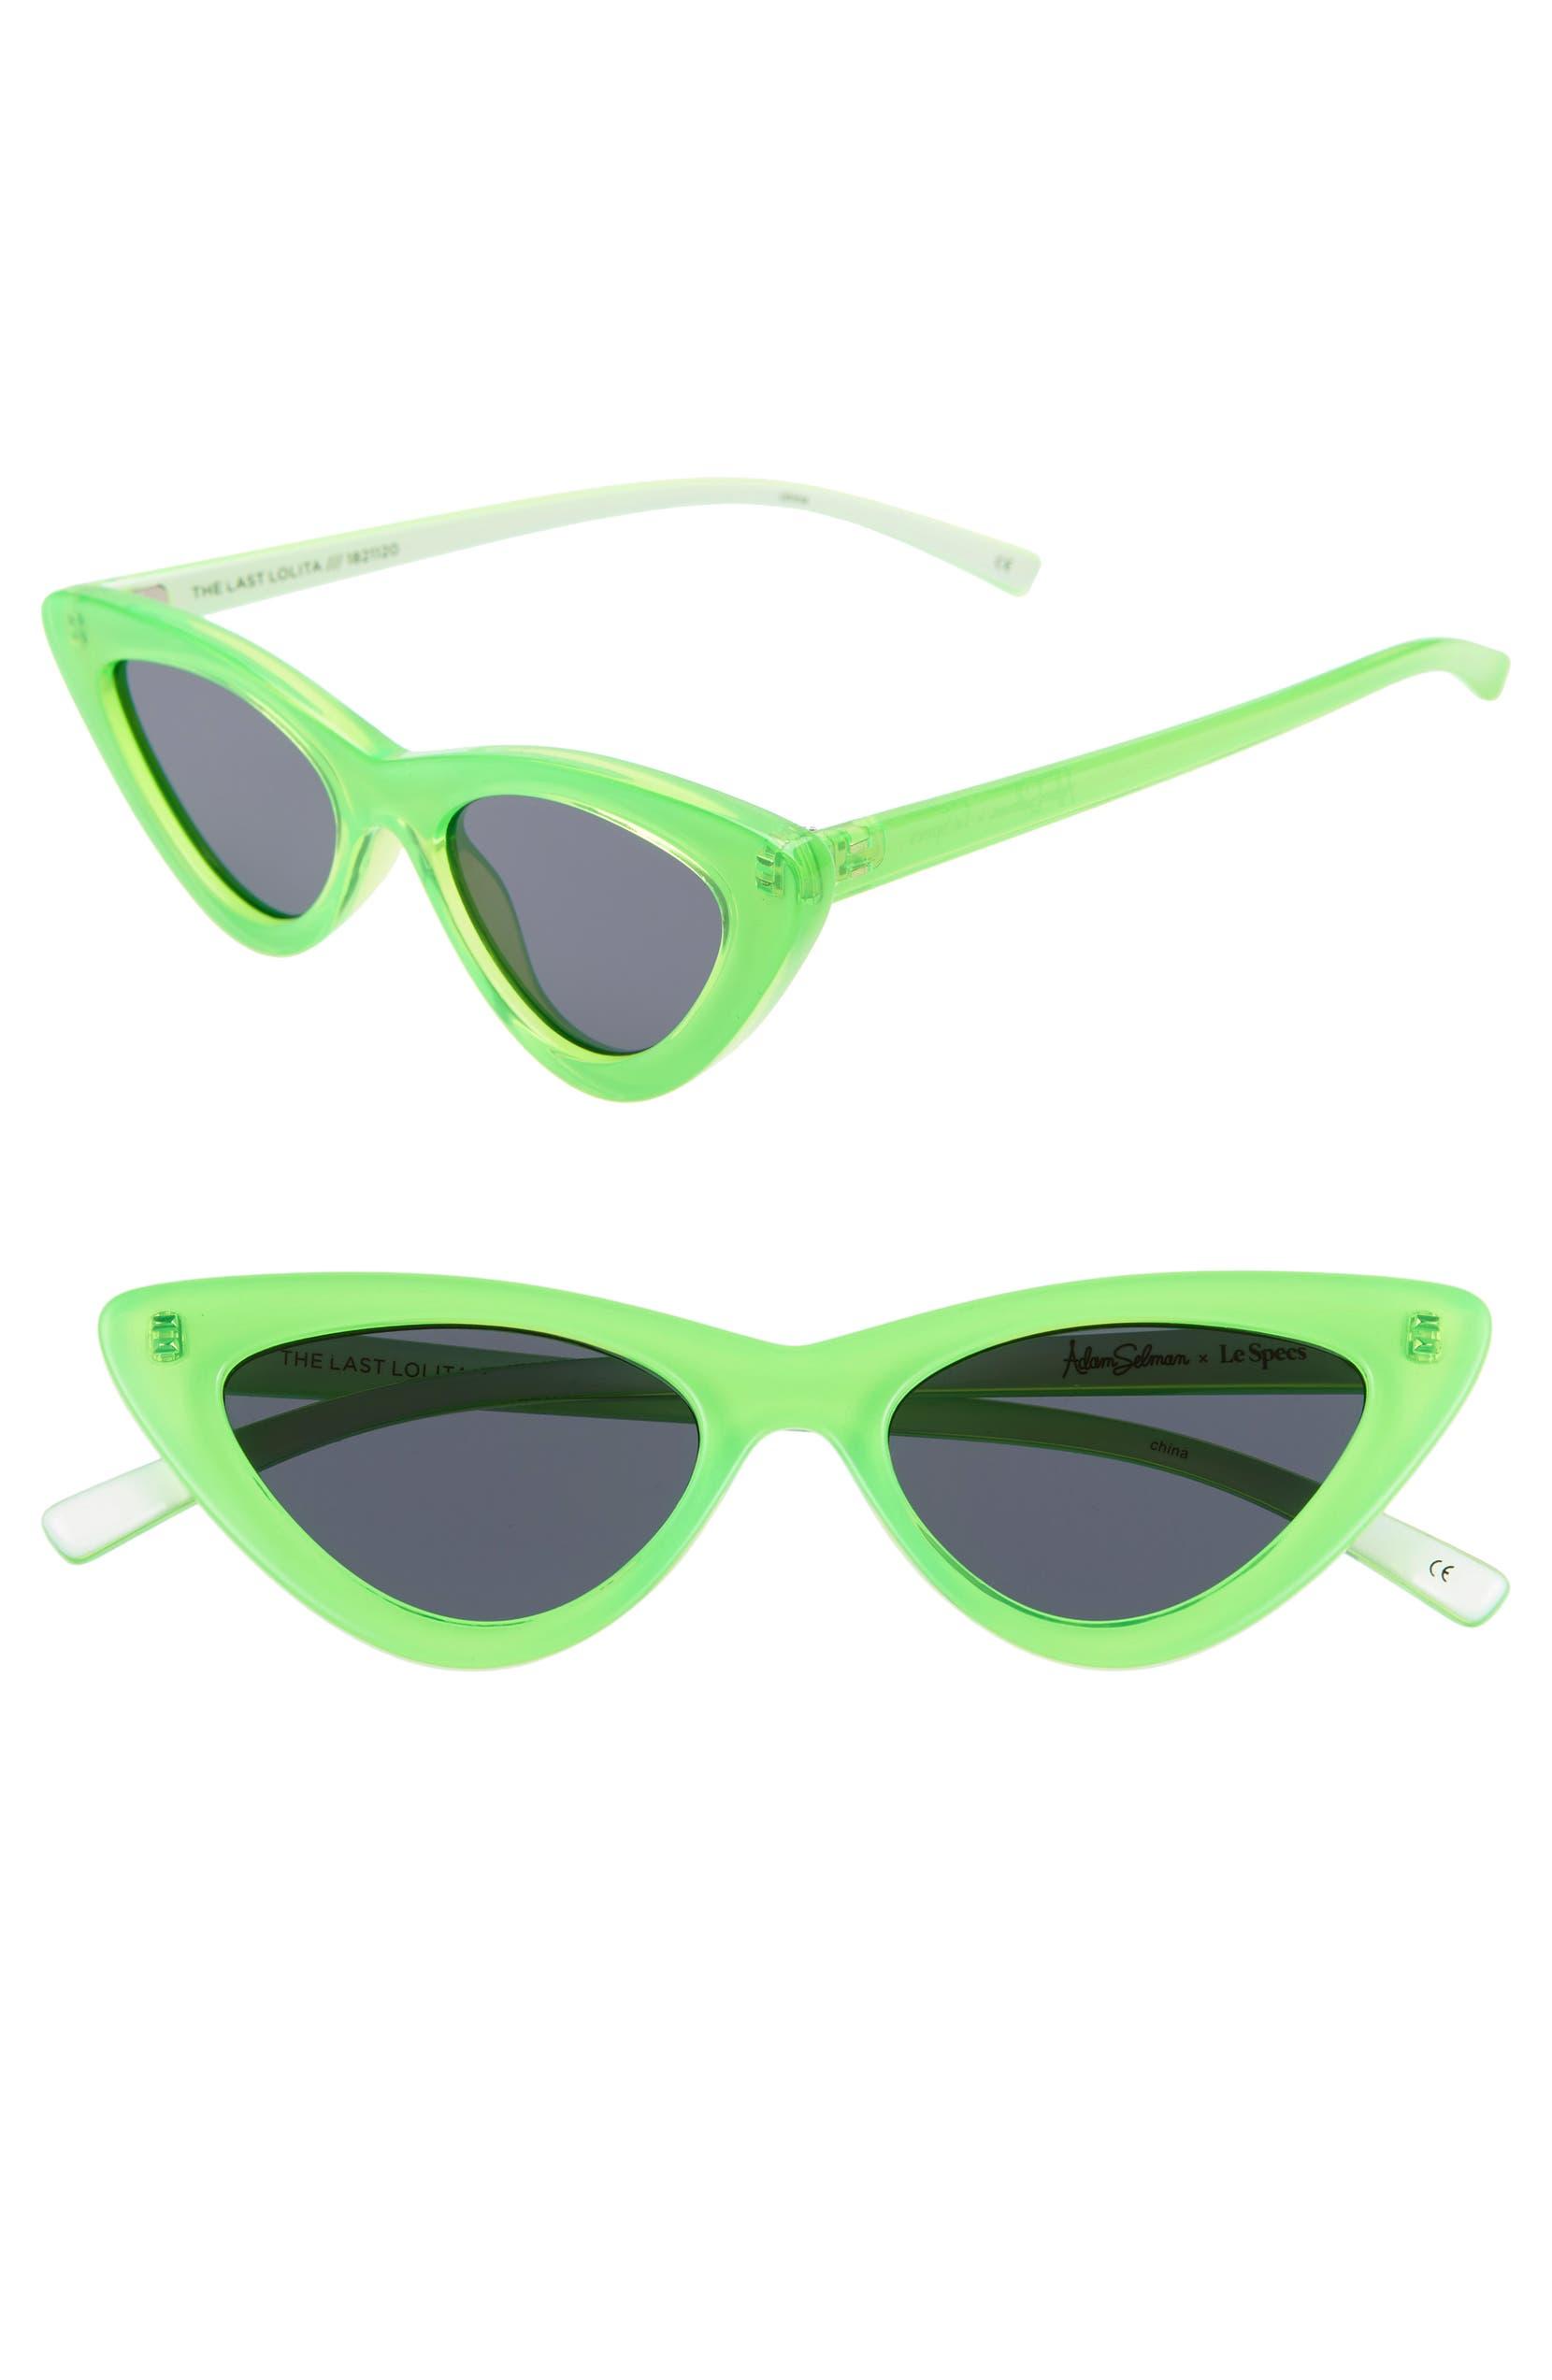 8b4936861d4 Lolita 49mm Cat Eye Sunglasses